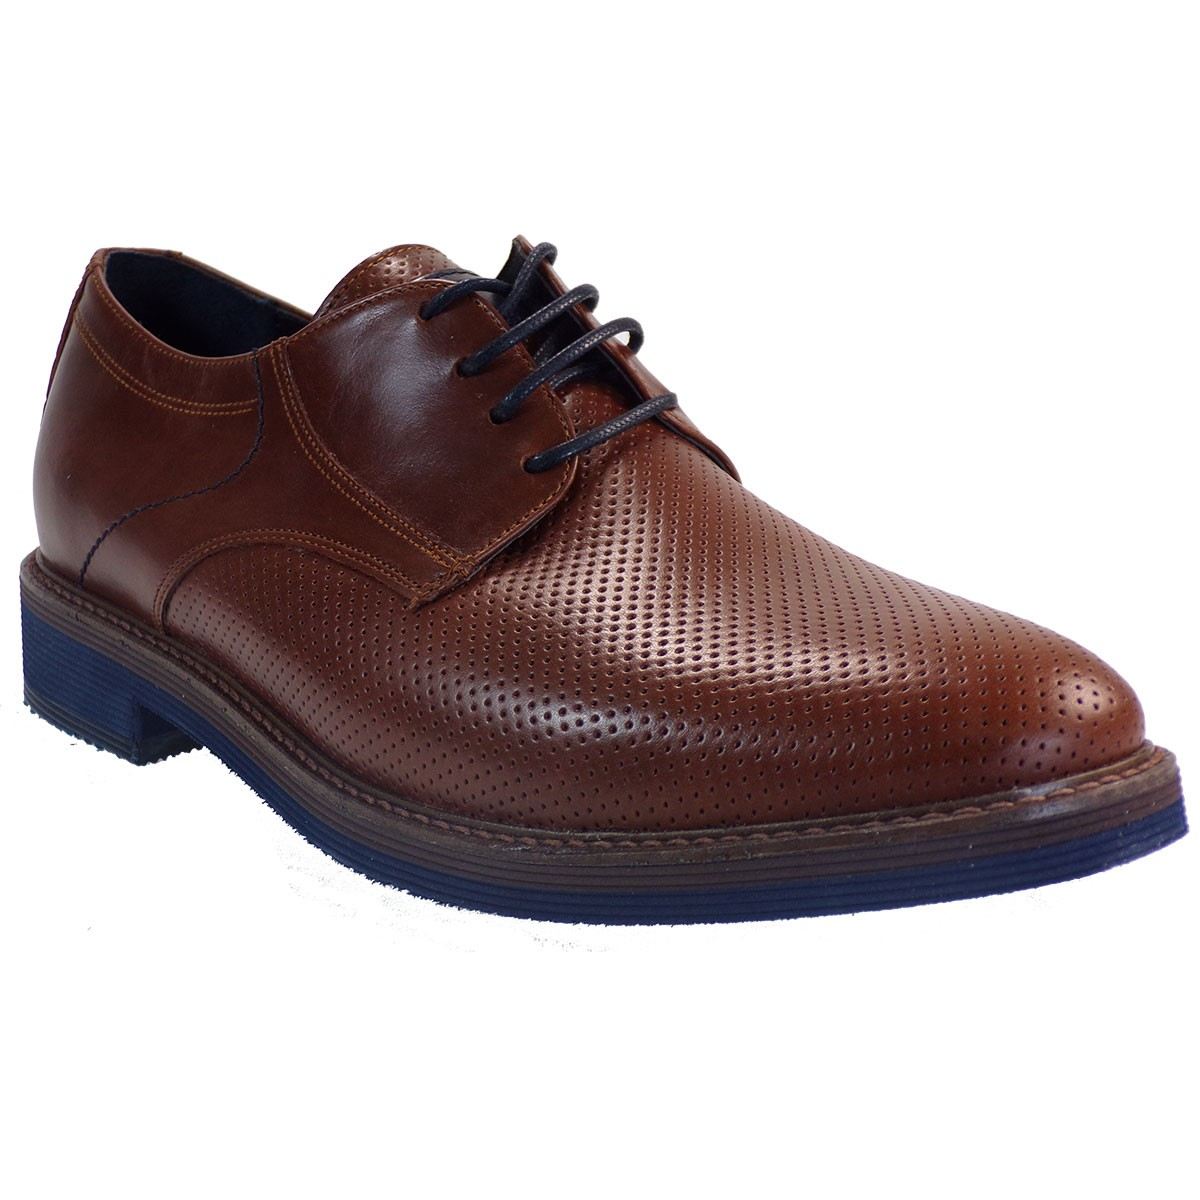 kricket Ανδρικά Παπούτσια 095 Ταμπά Δέρμα